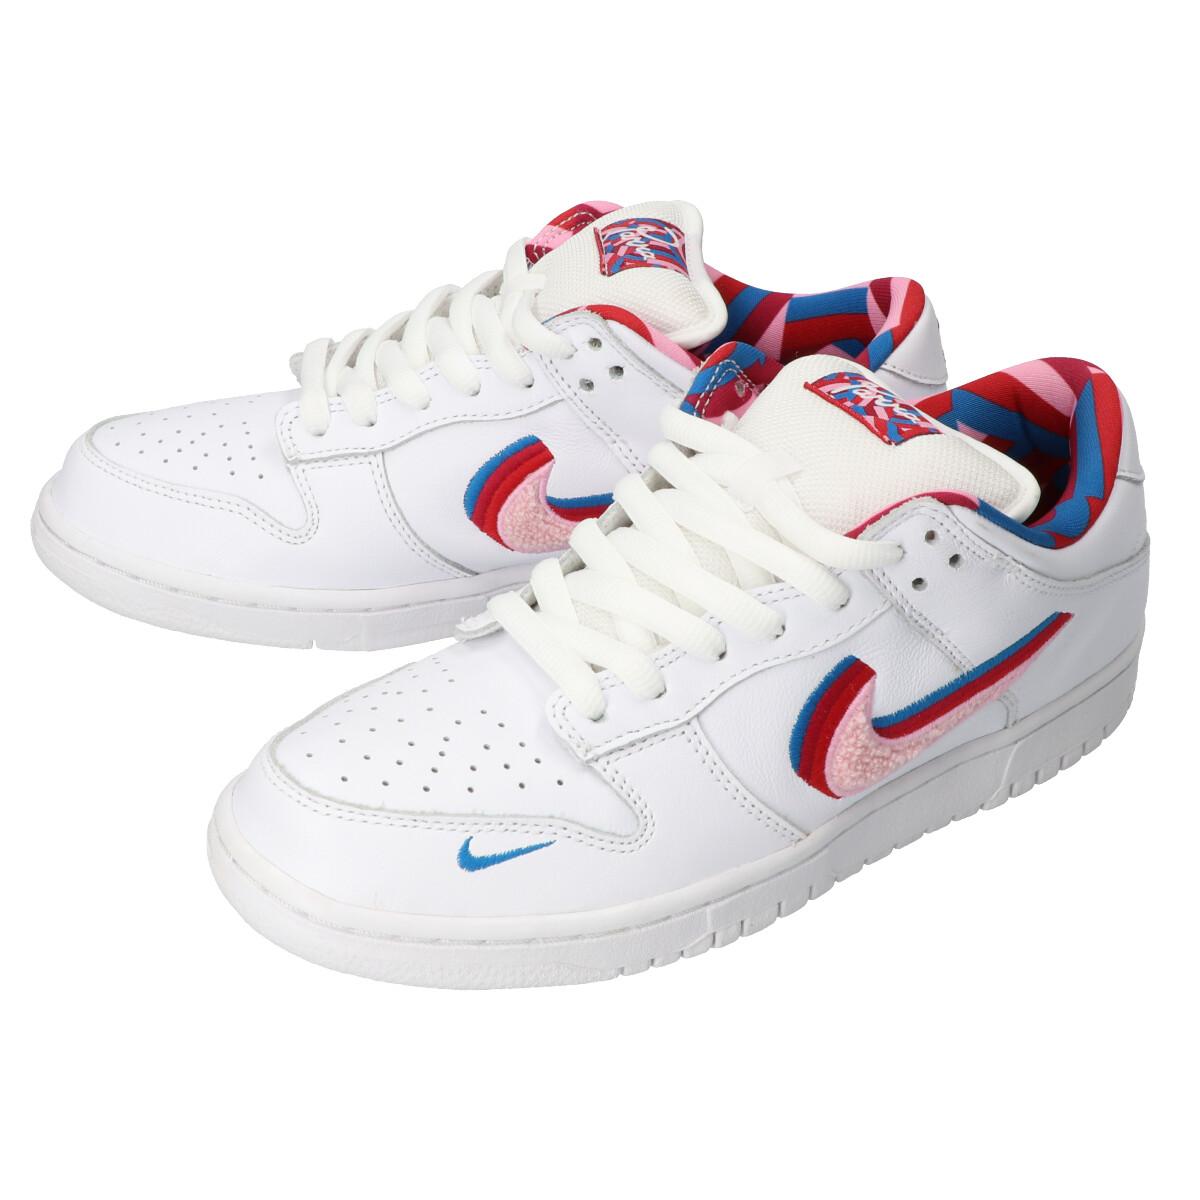 Nike SB x Parra Dunk Low OG QS Scarpa (white pink rise) fare